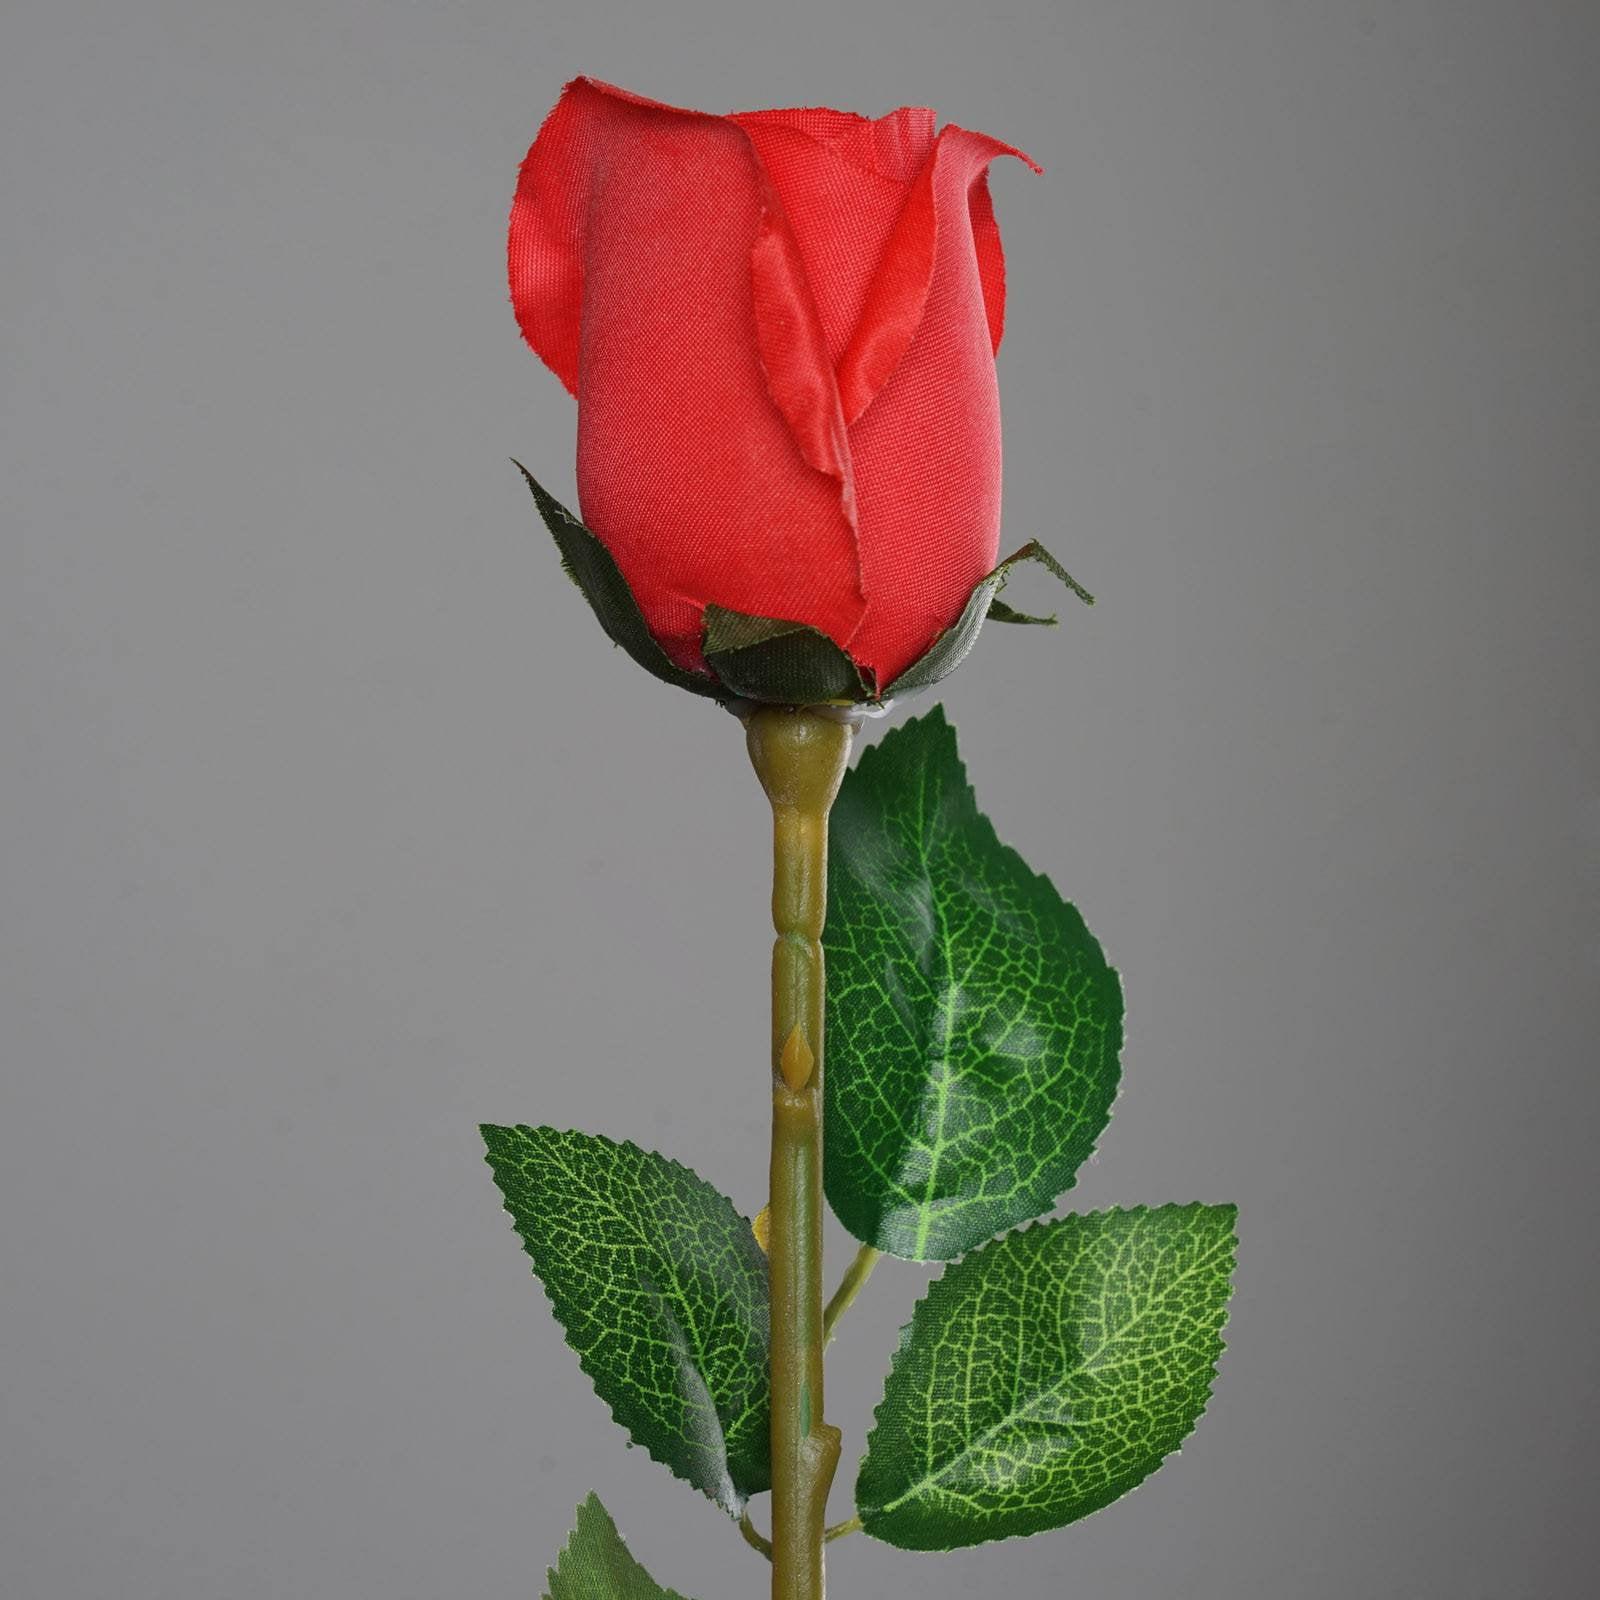 BalsaCircle 24 Single Stems Silk Artificial Roses - DIY Home Wedding Flowers Party Bouquets Arrangements Centerpieces